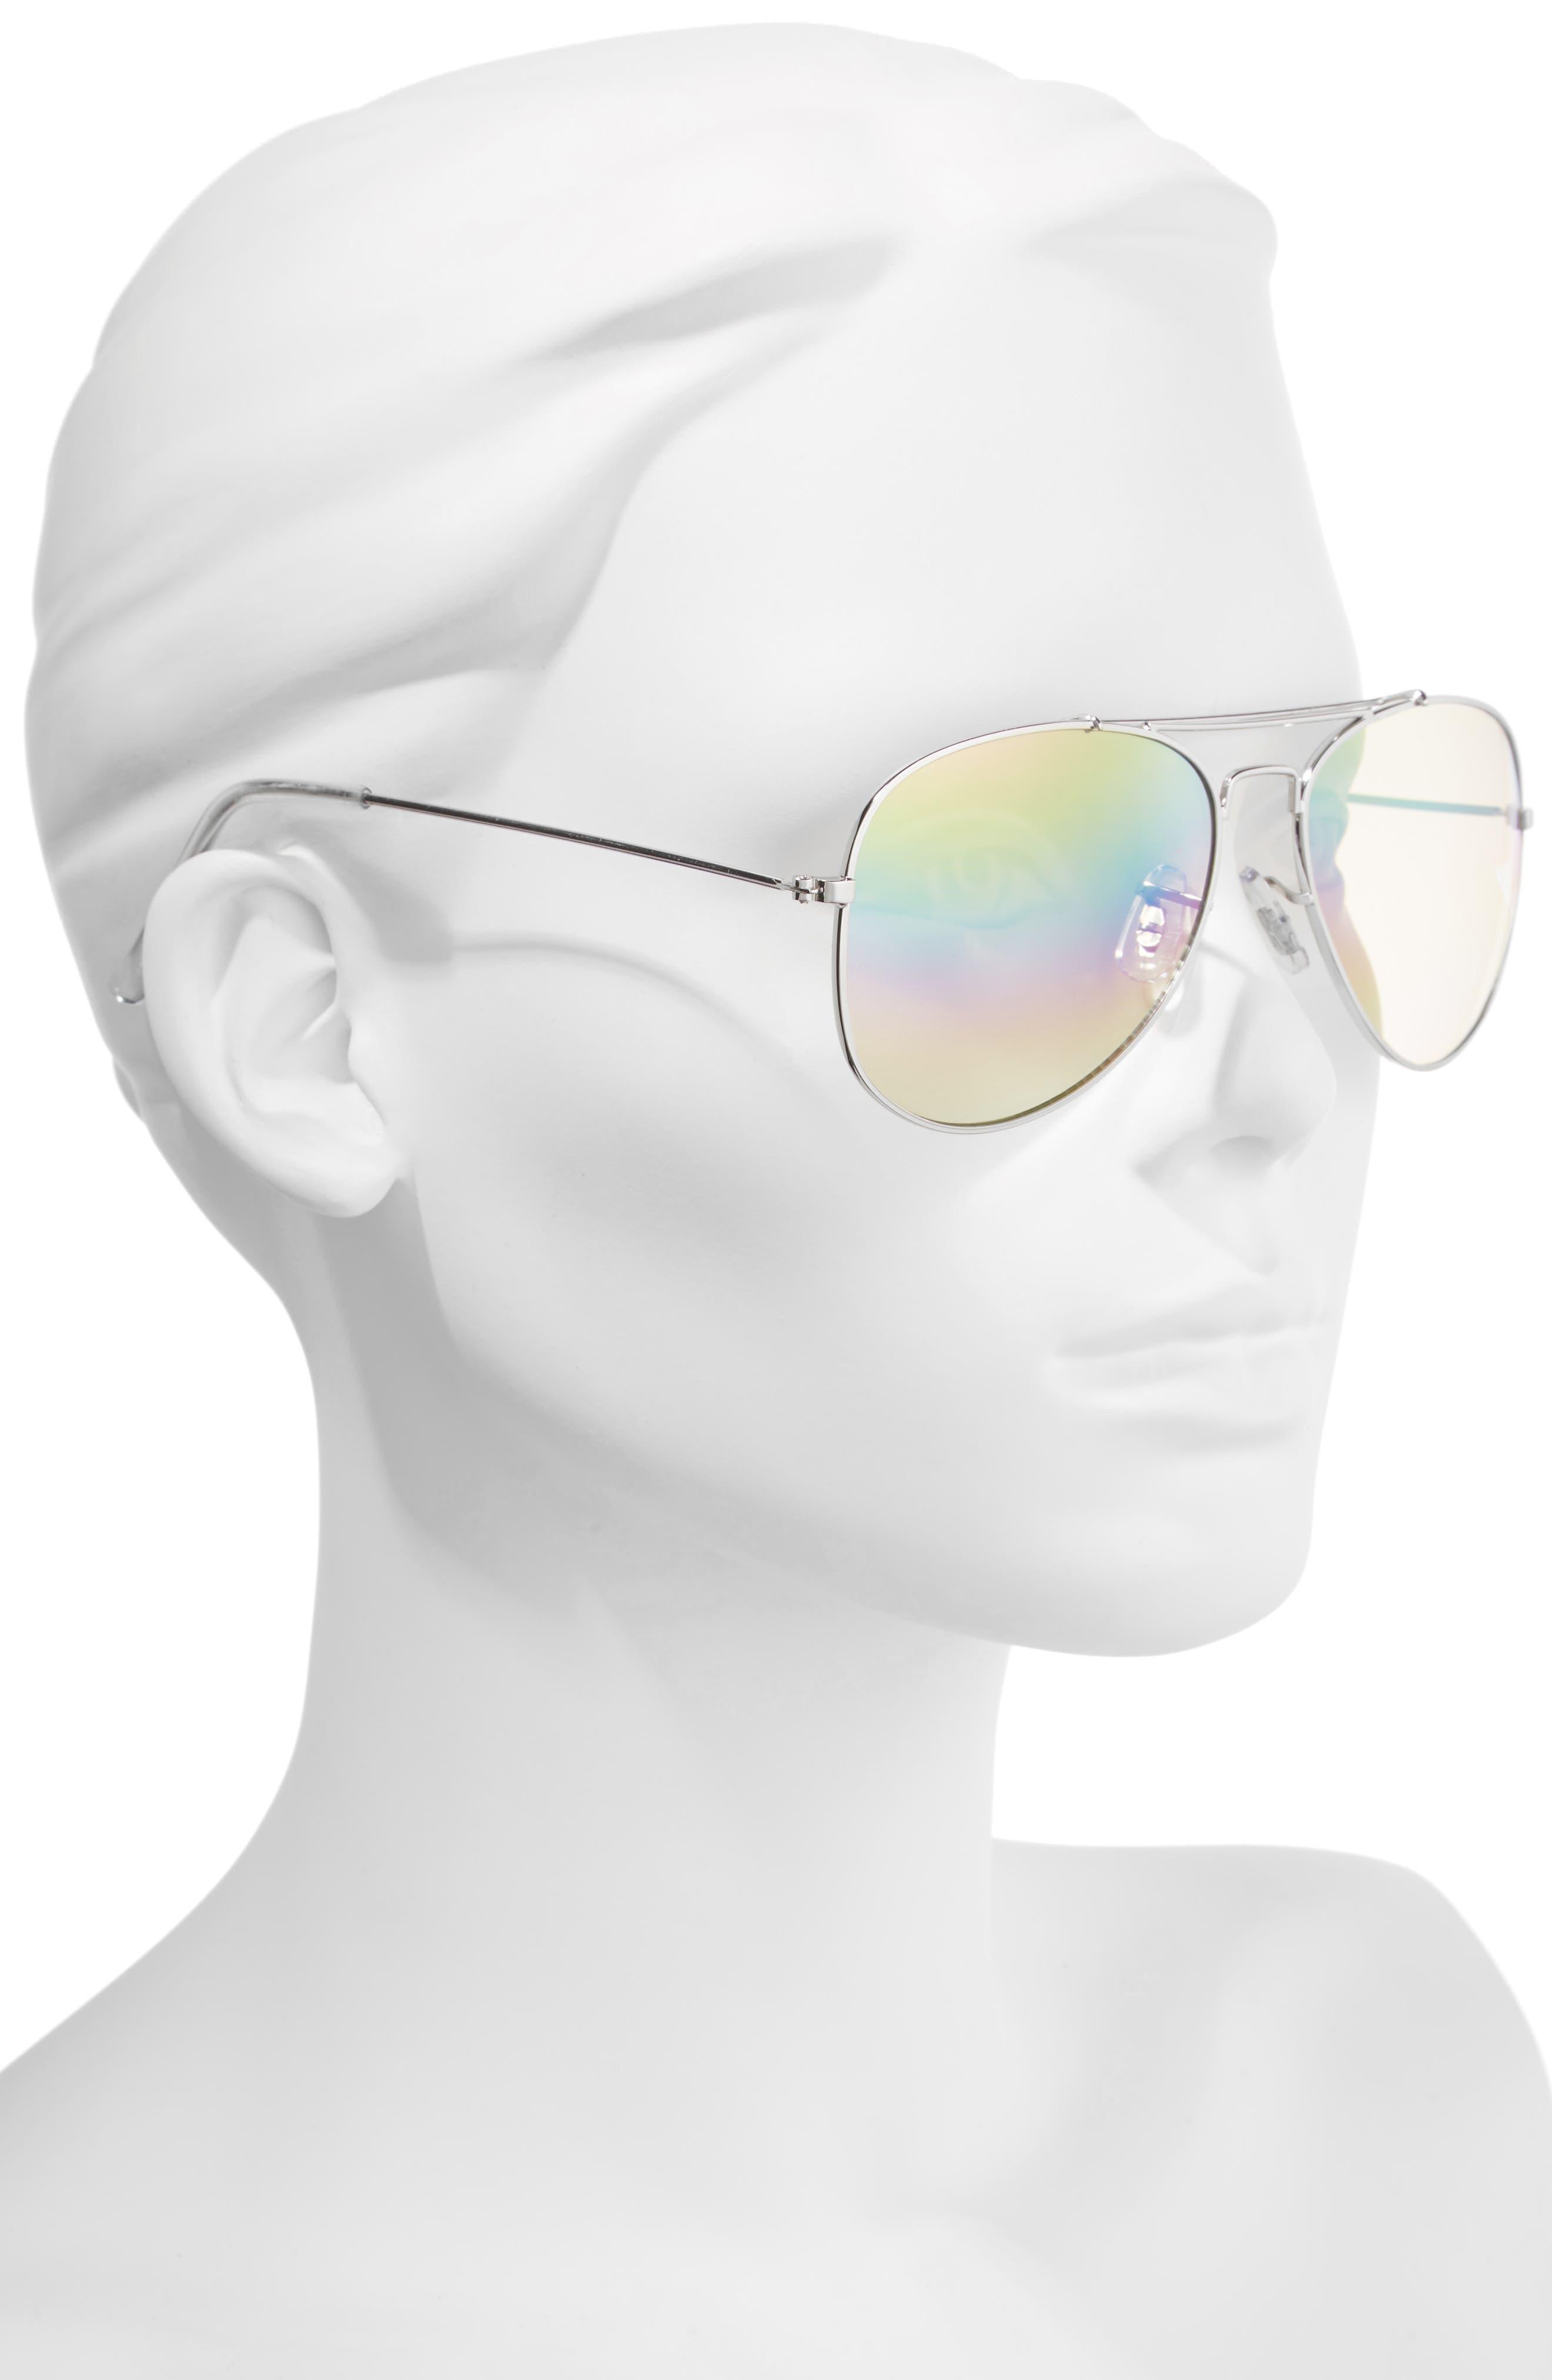 Rainbow Aviator Sunglasses,                             Alternate thumbnail 2, color,                             040